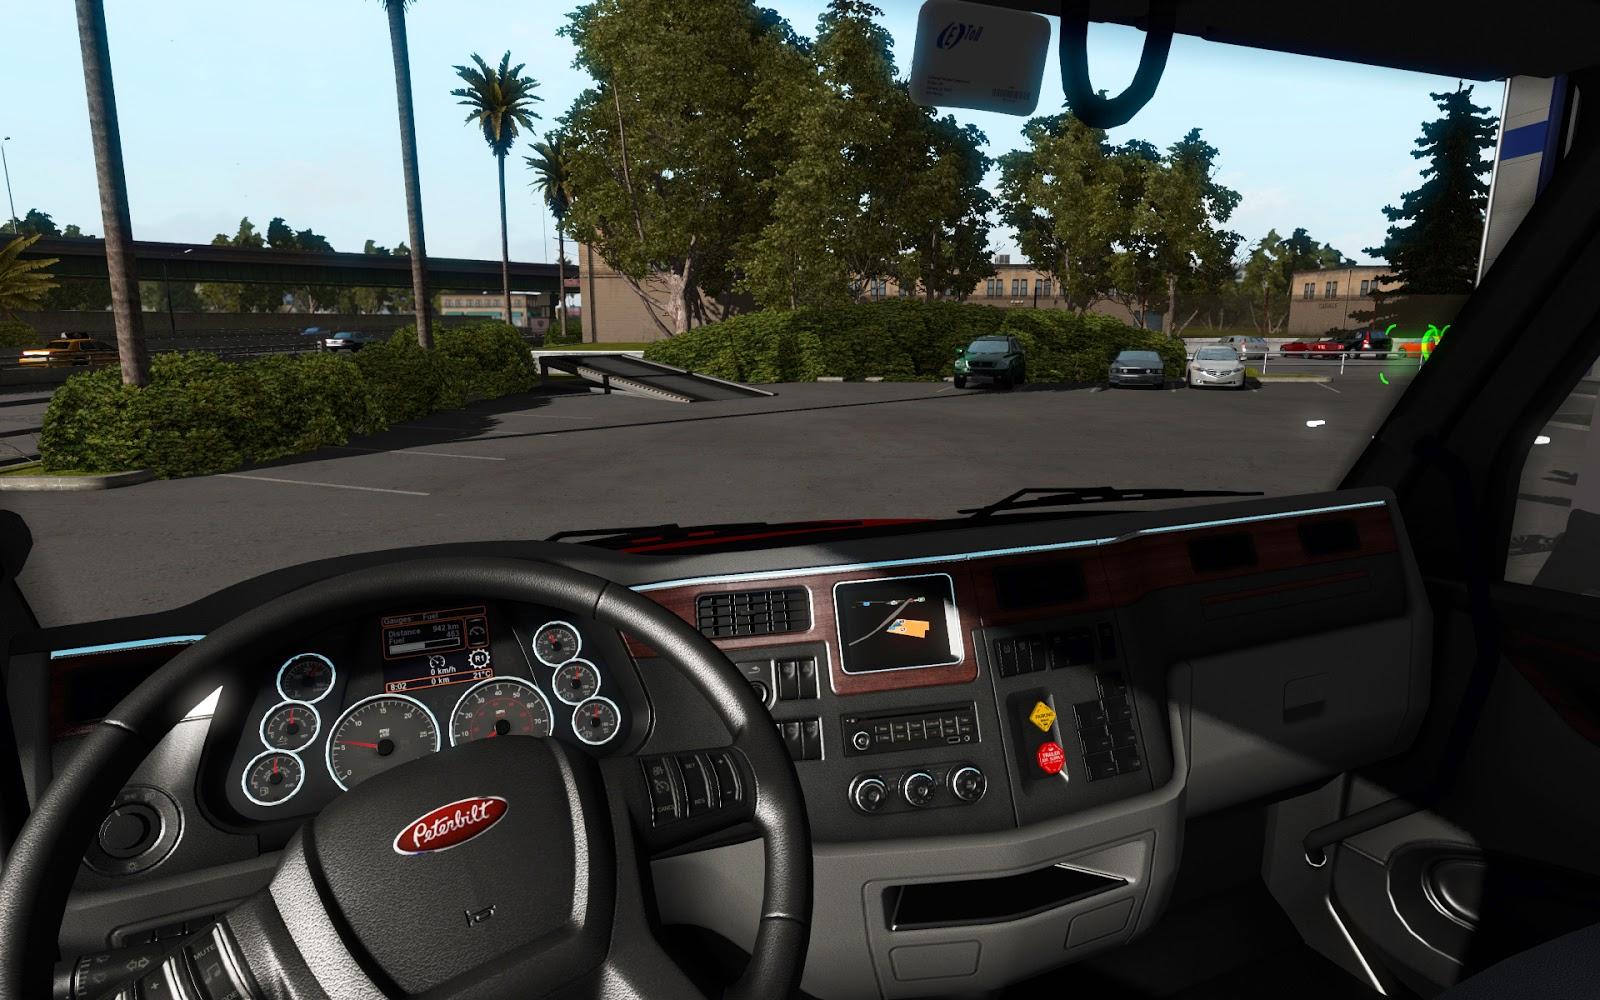 Peterbilt interior from ATS | American Truck Simulator mods